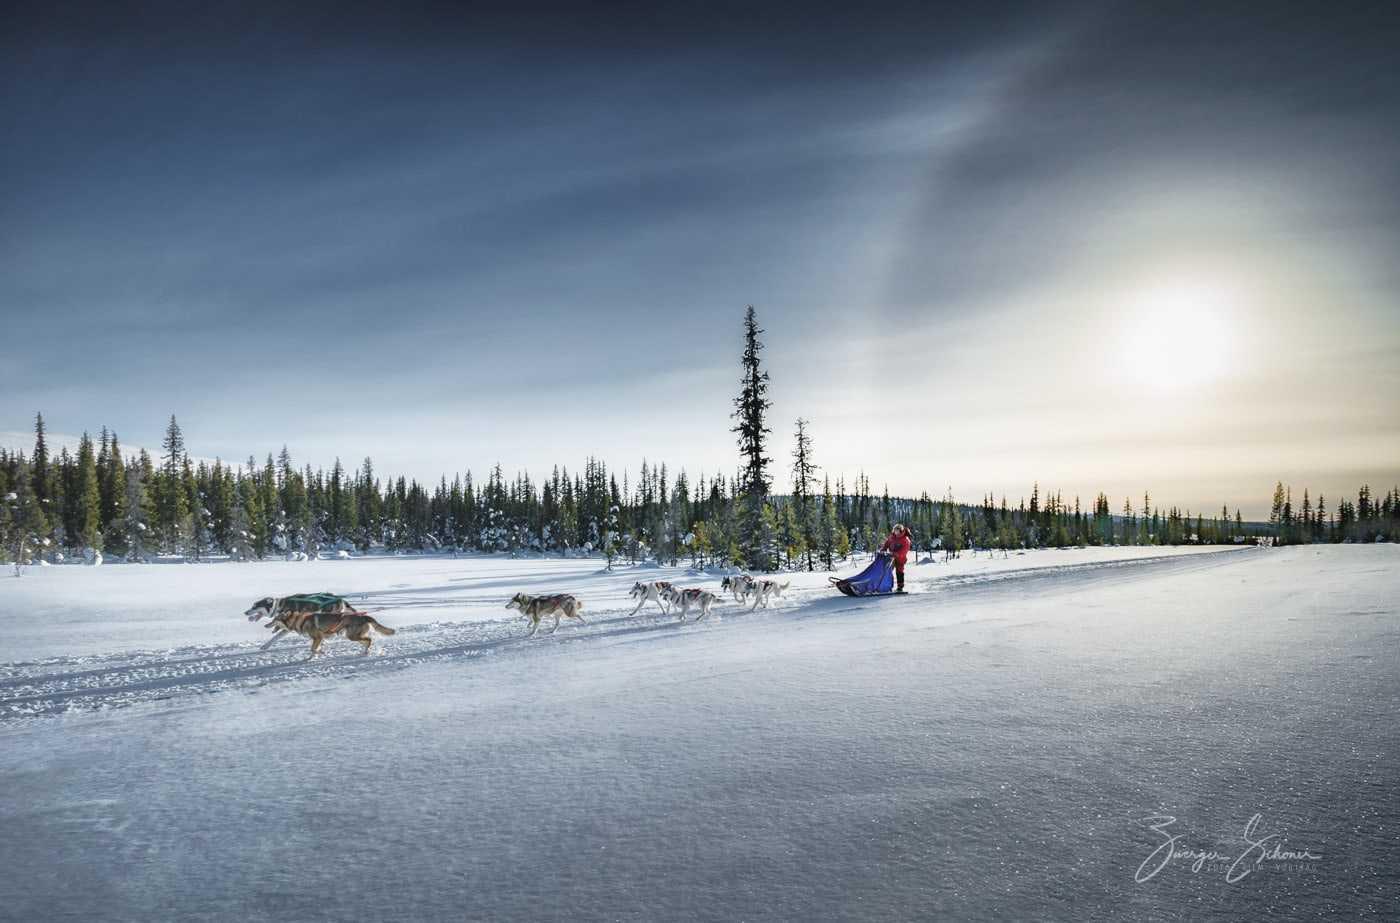 Hundeschlittenfahren Nordschweden - Huskytour